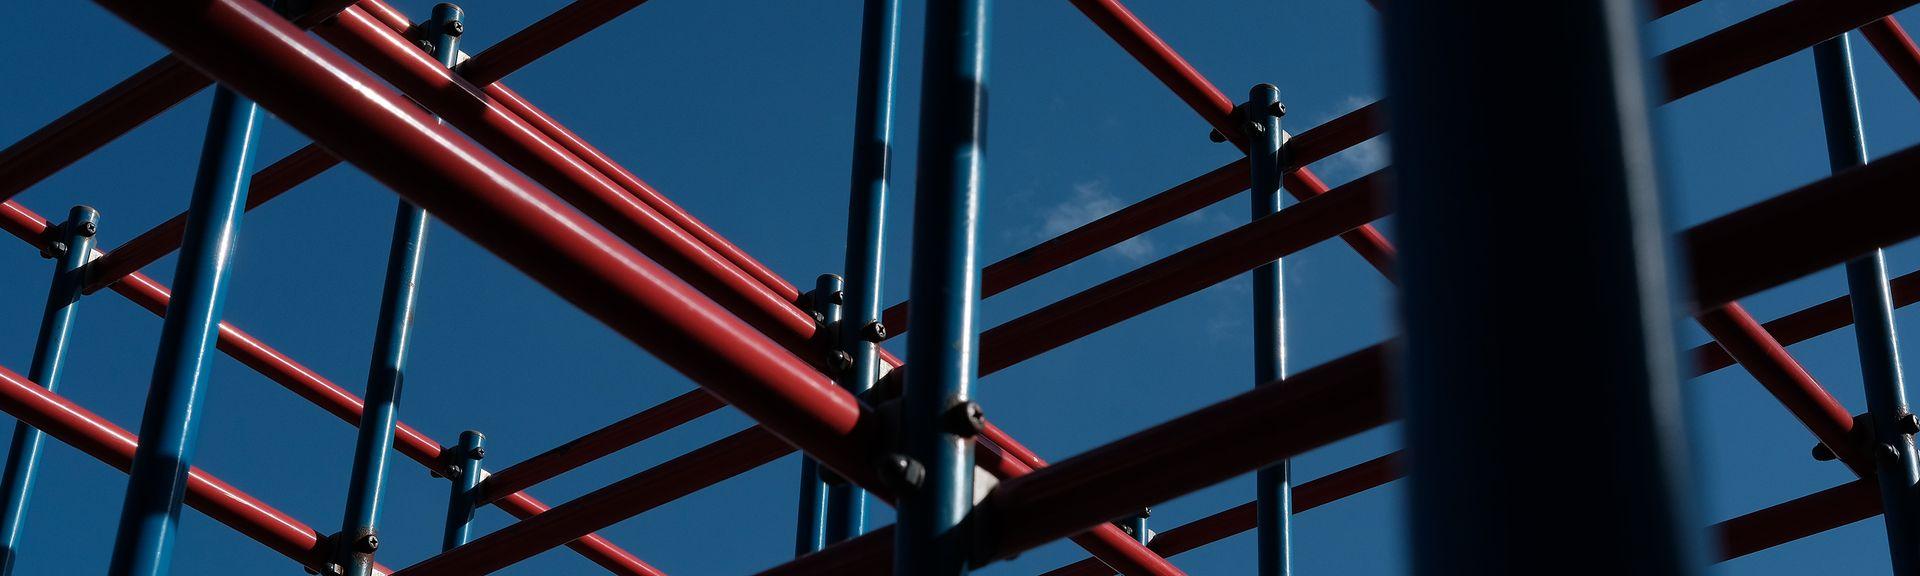 Almeria Builders - Scaffolding